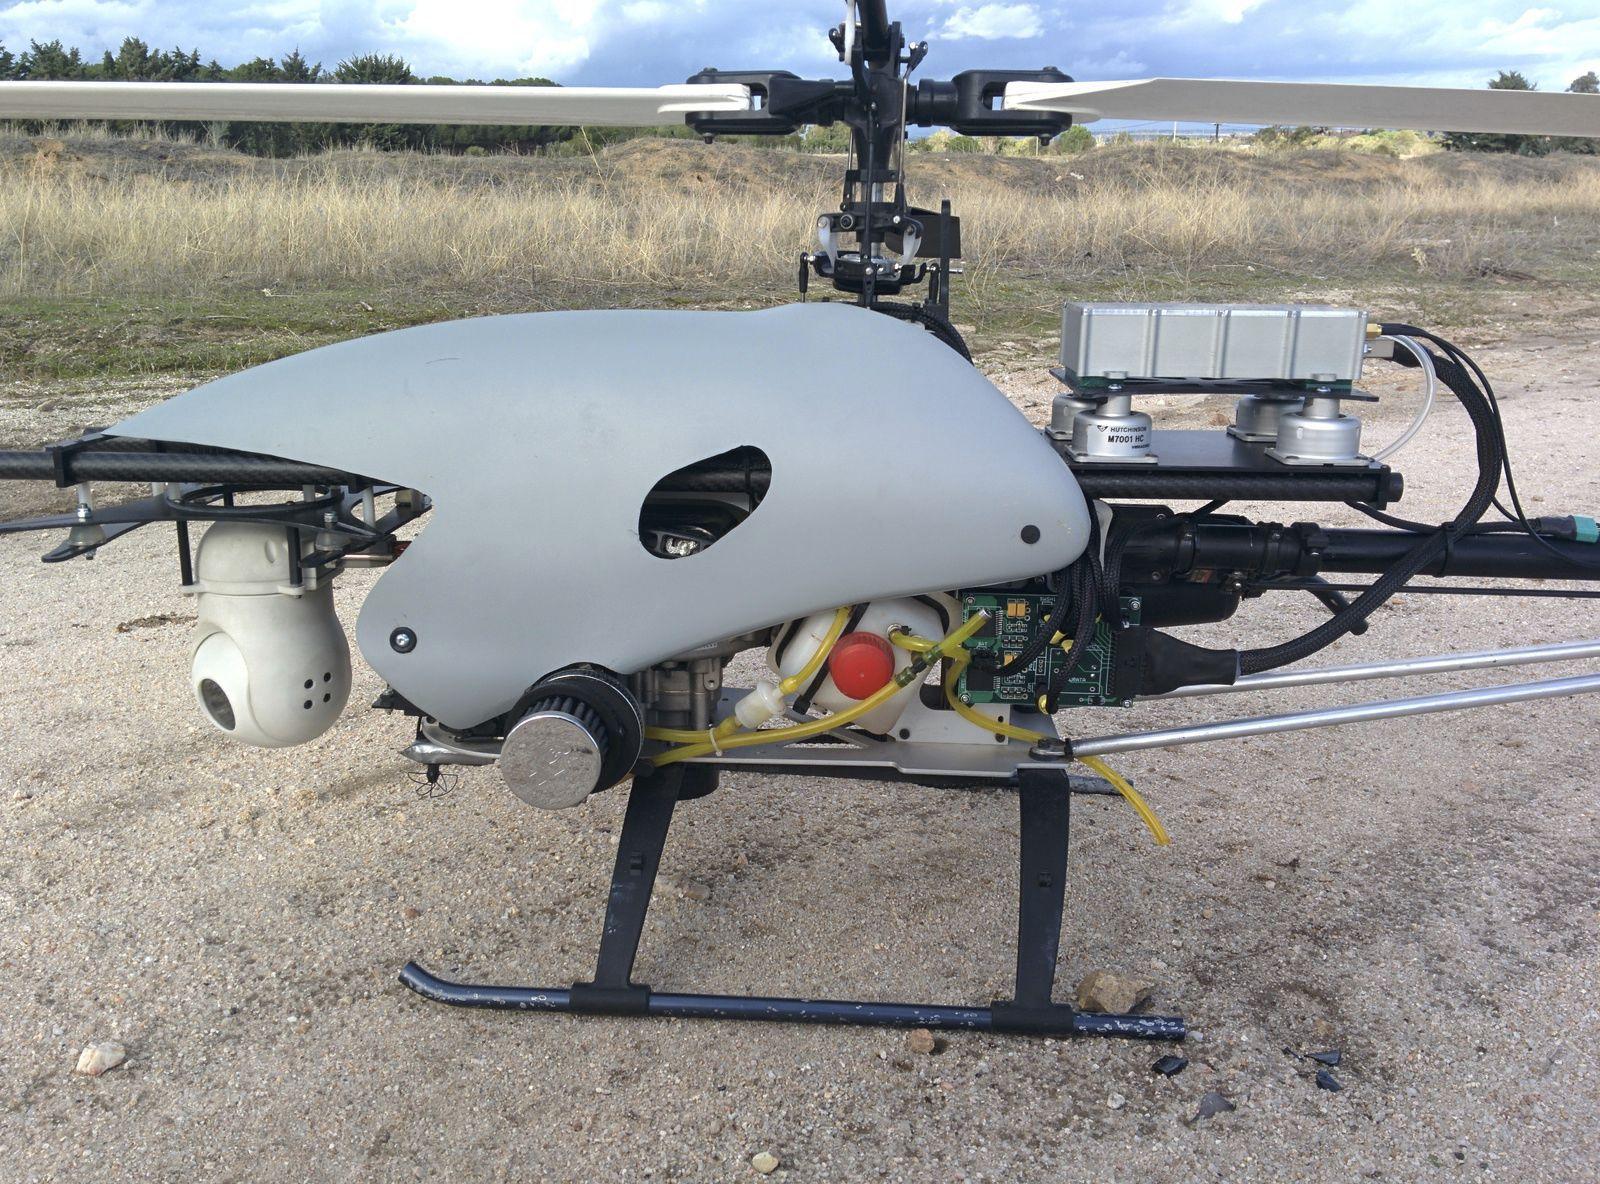 Elicottero Usato : Drone agricolo elicottero con motore a pistoni benzine kit